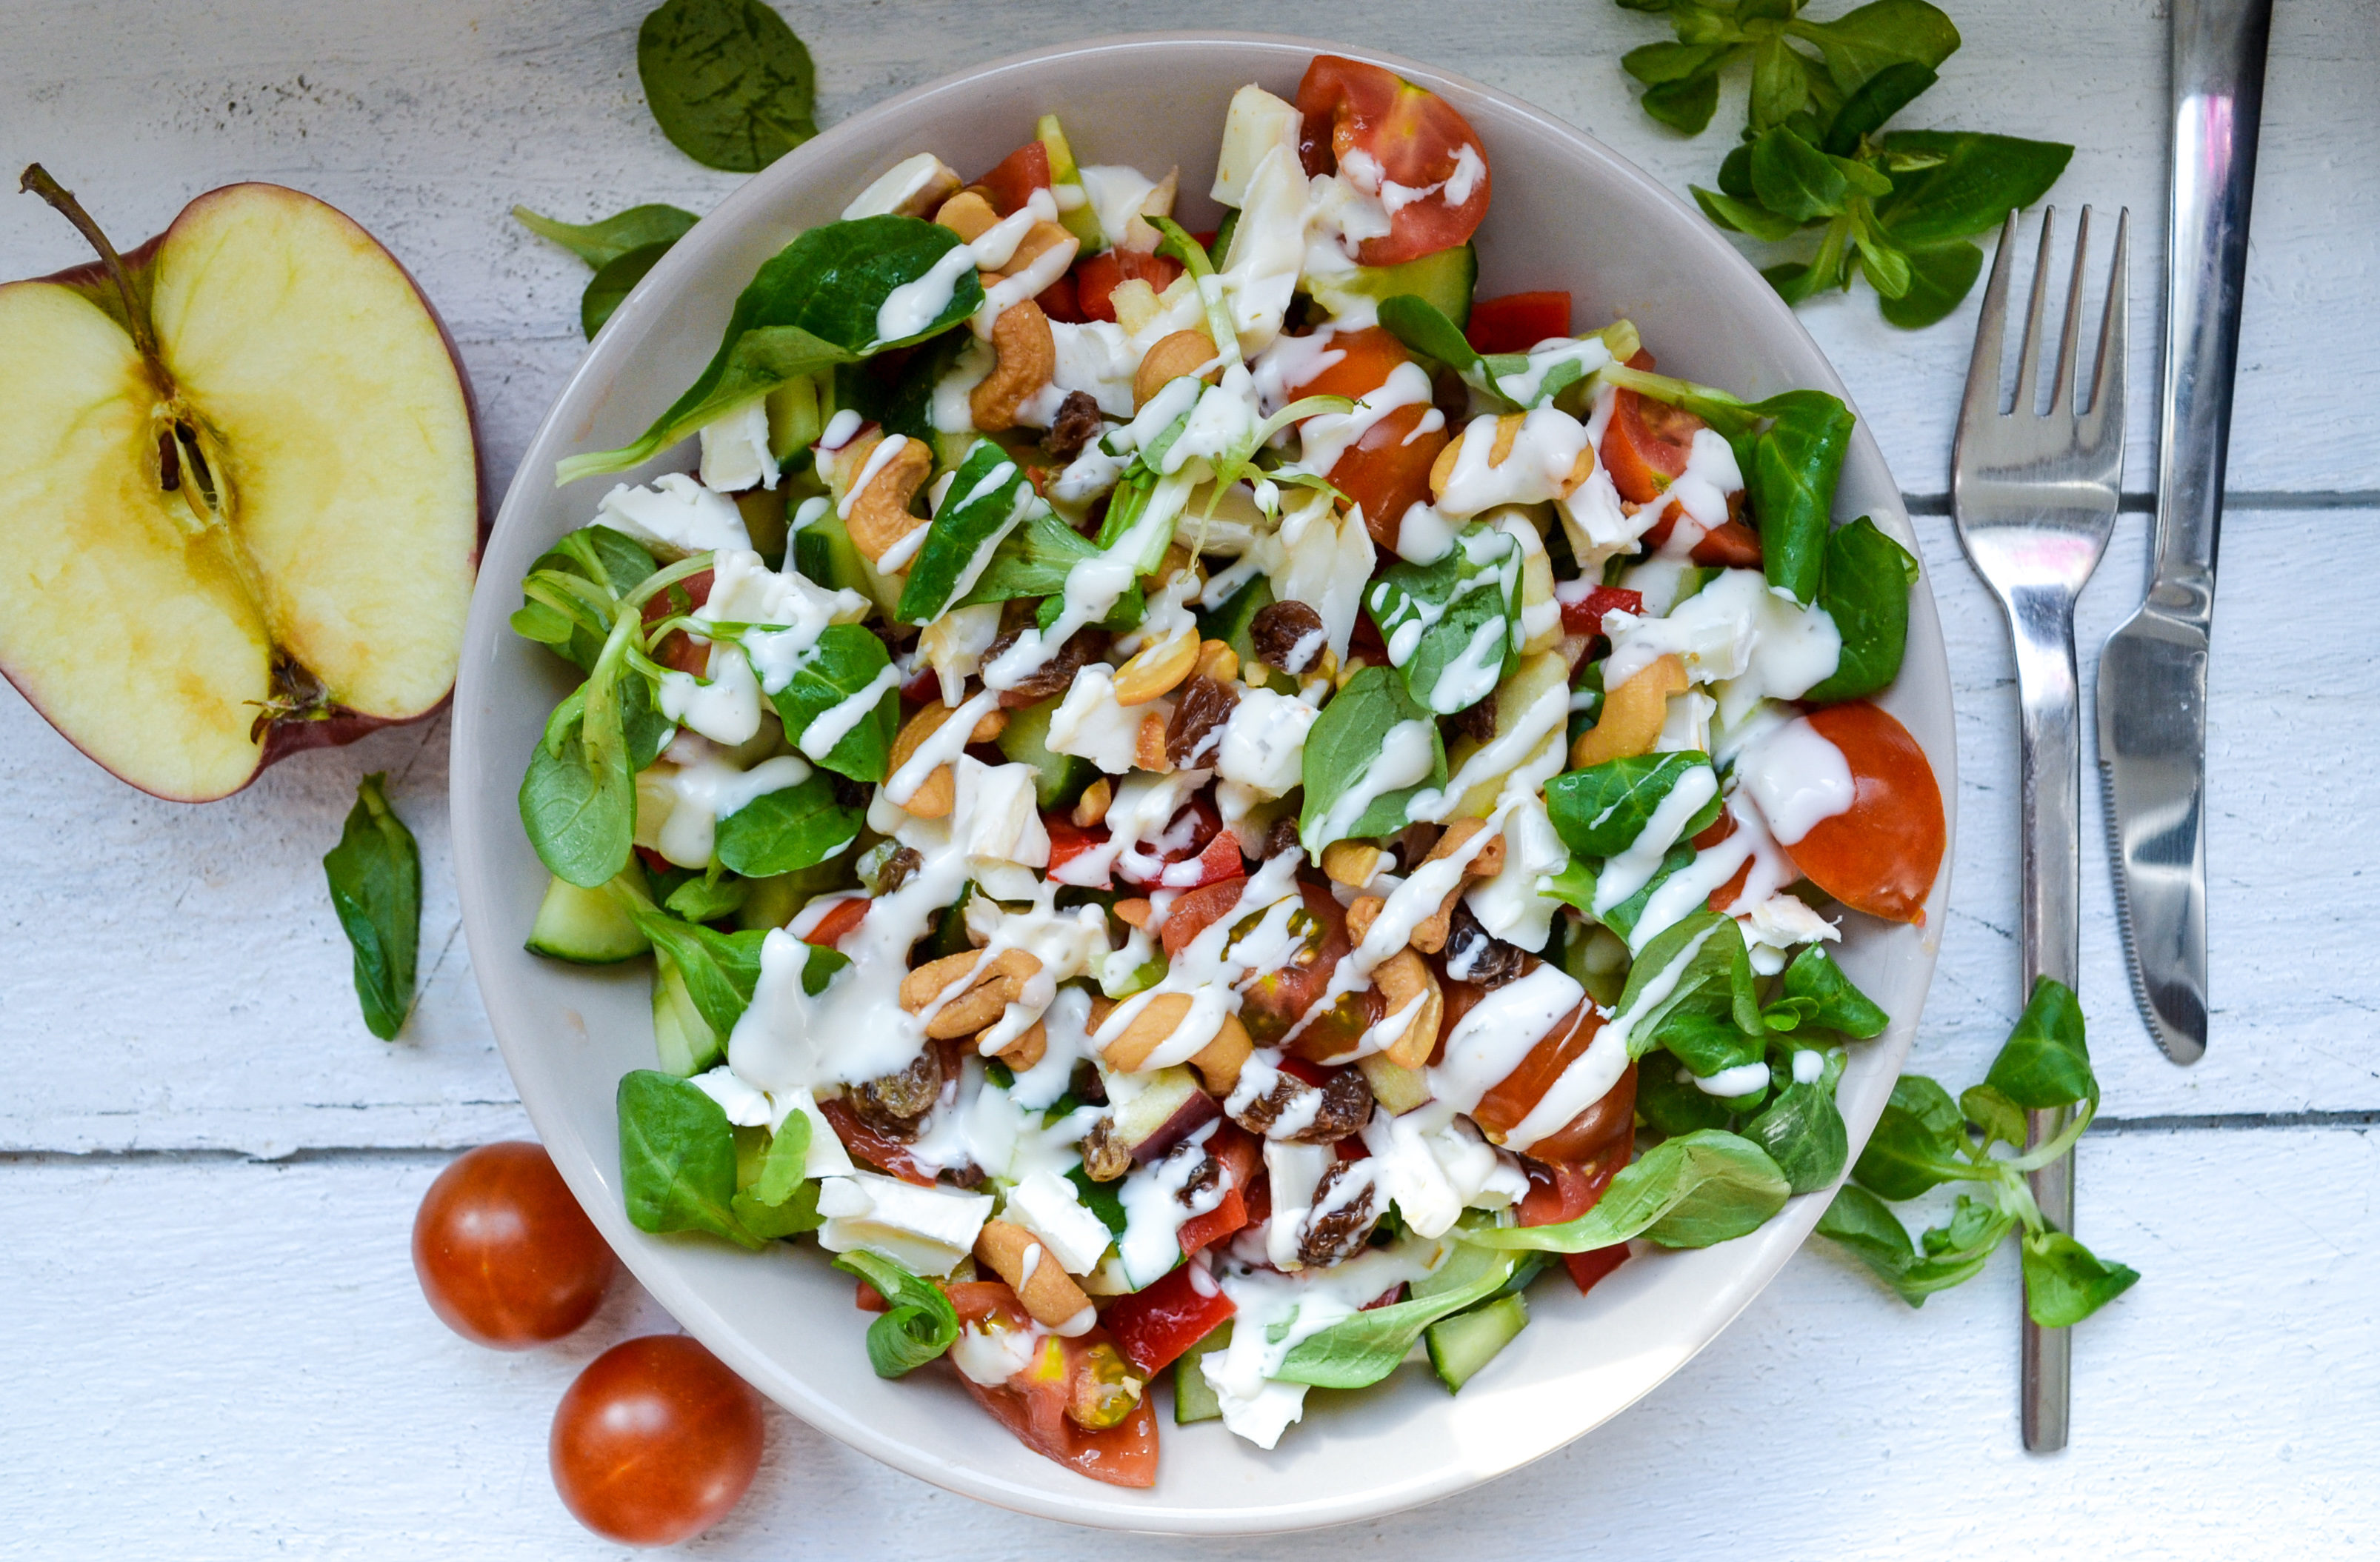 Mijn favoriete zomerse salade